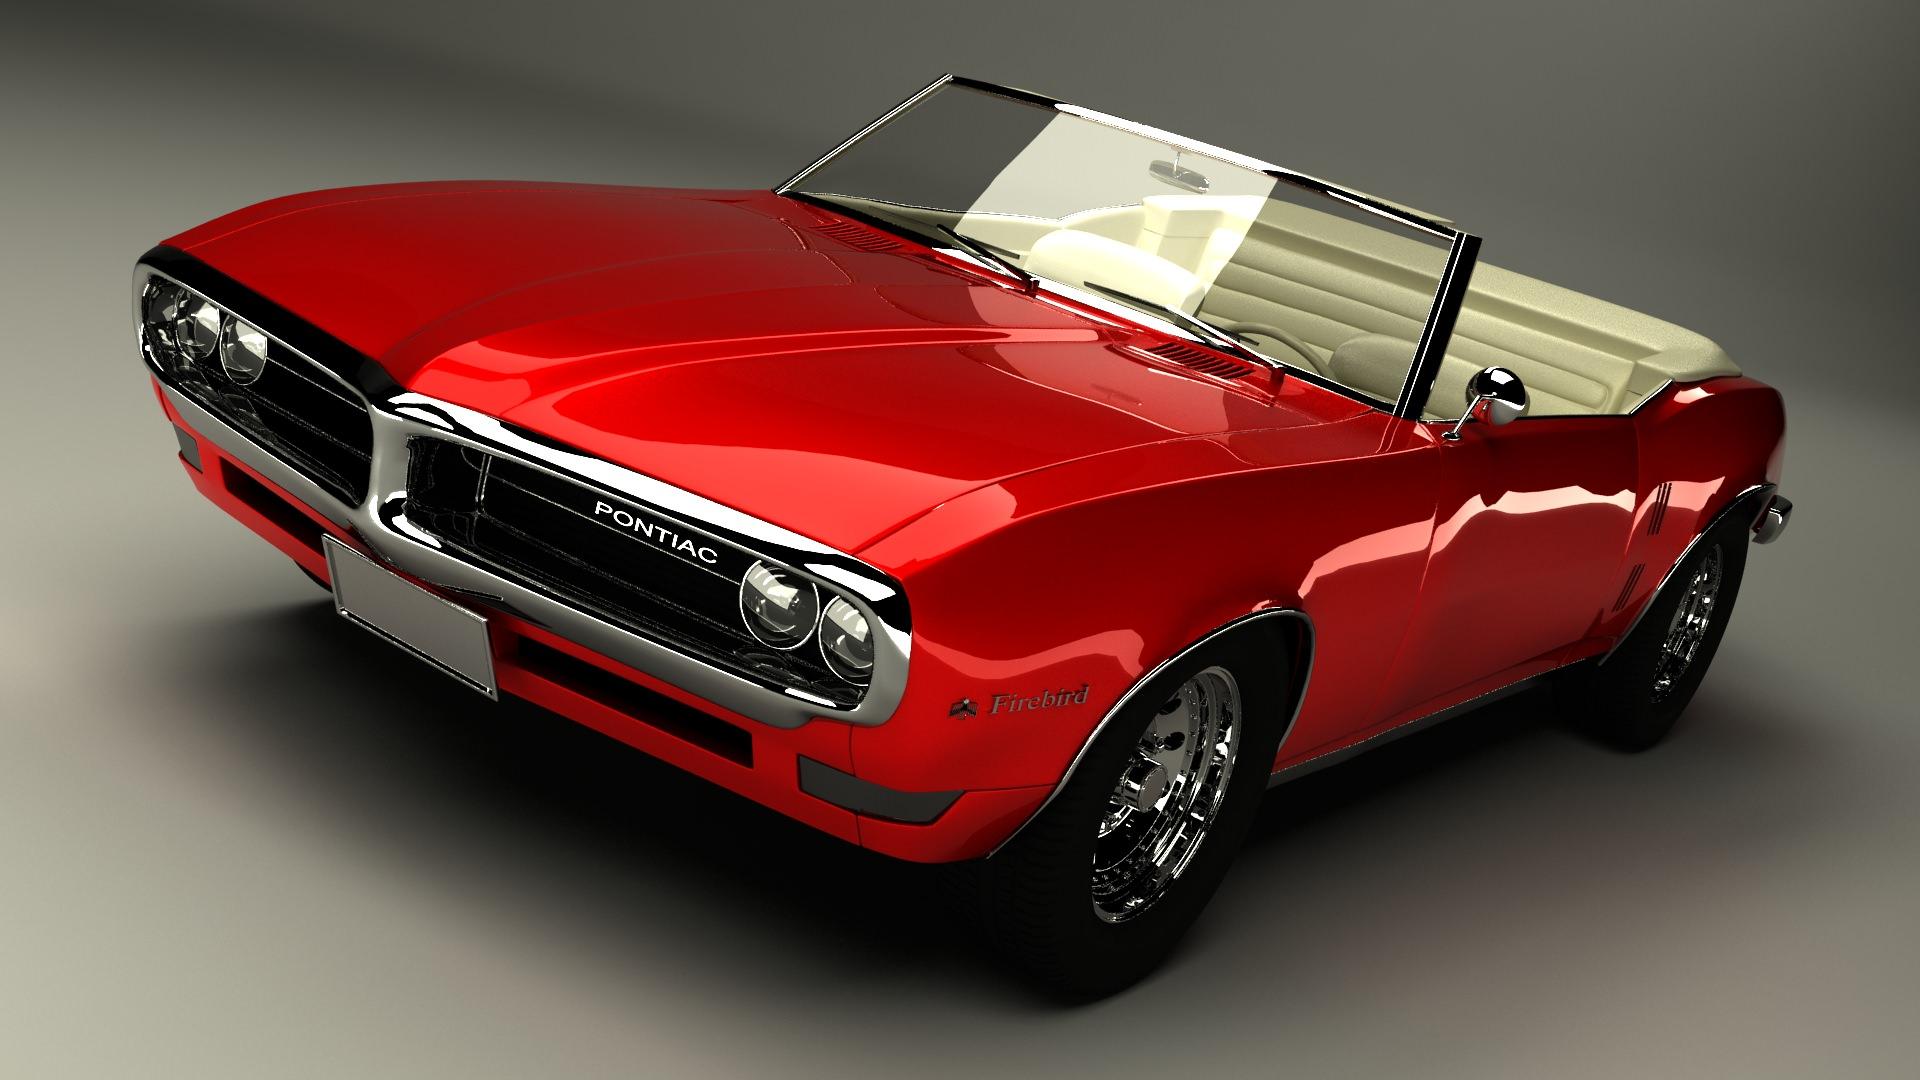 Pontiac Firebird Convertible 1968 Model Max 1